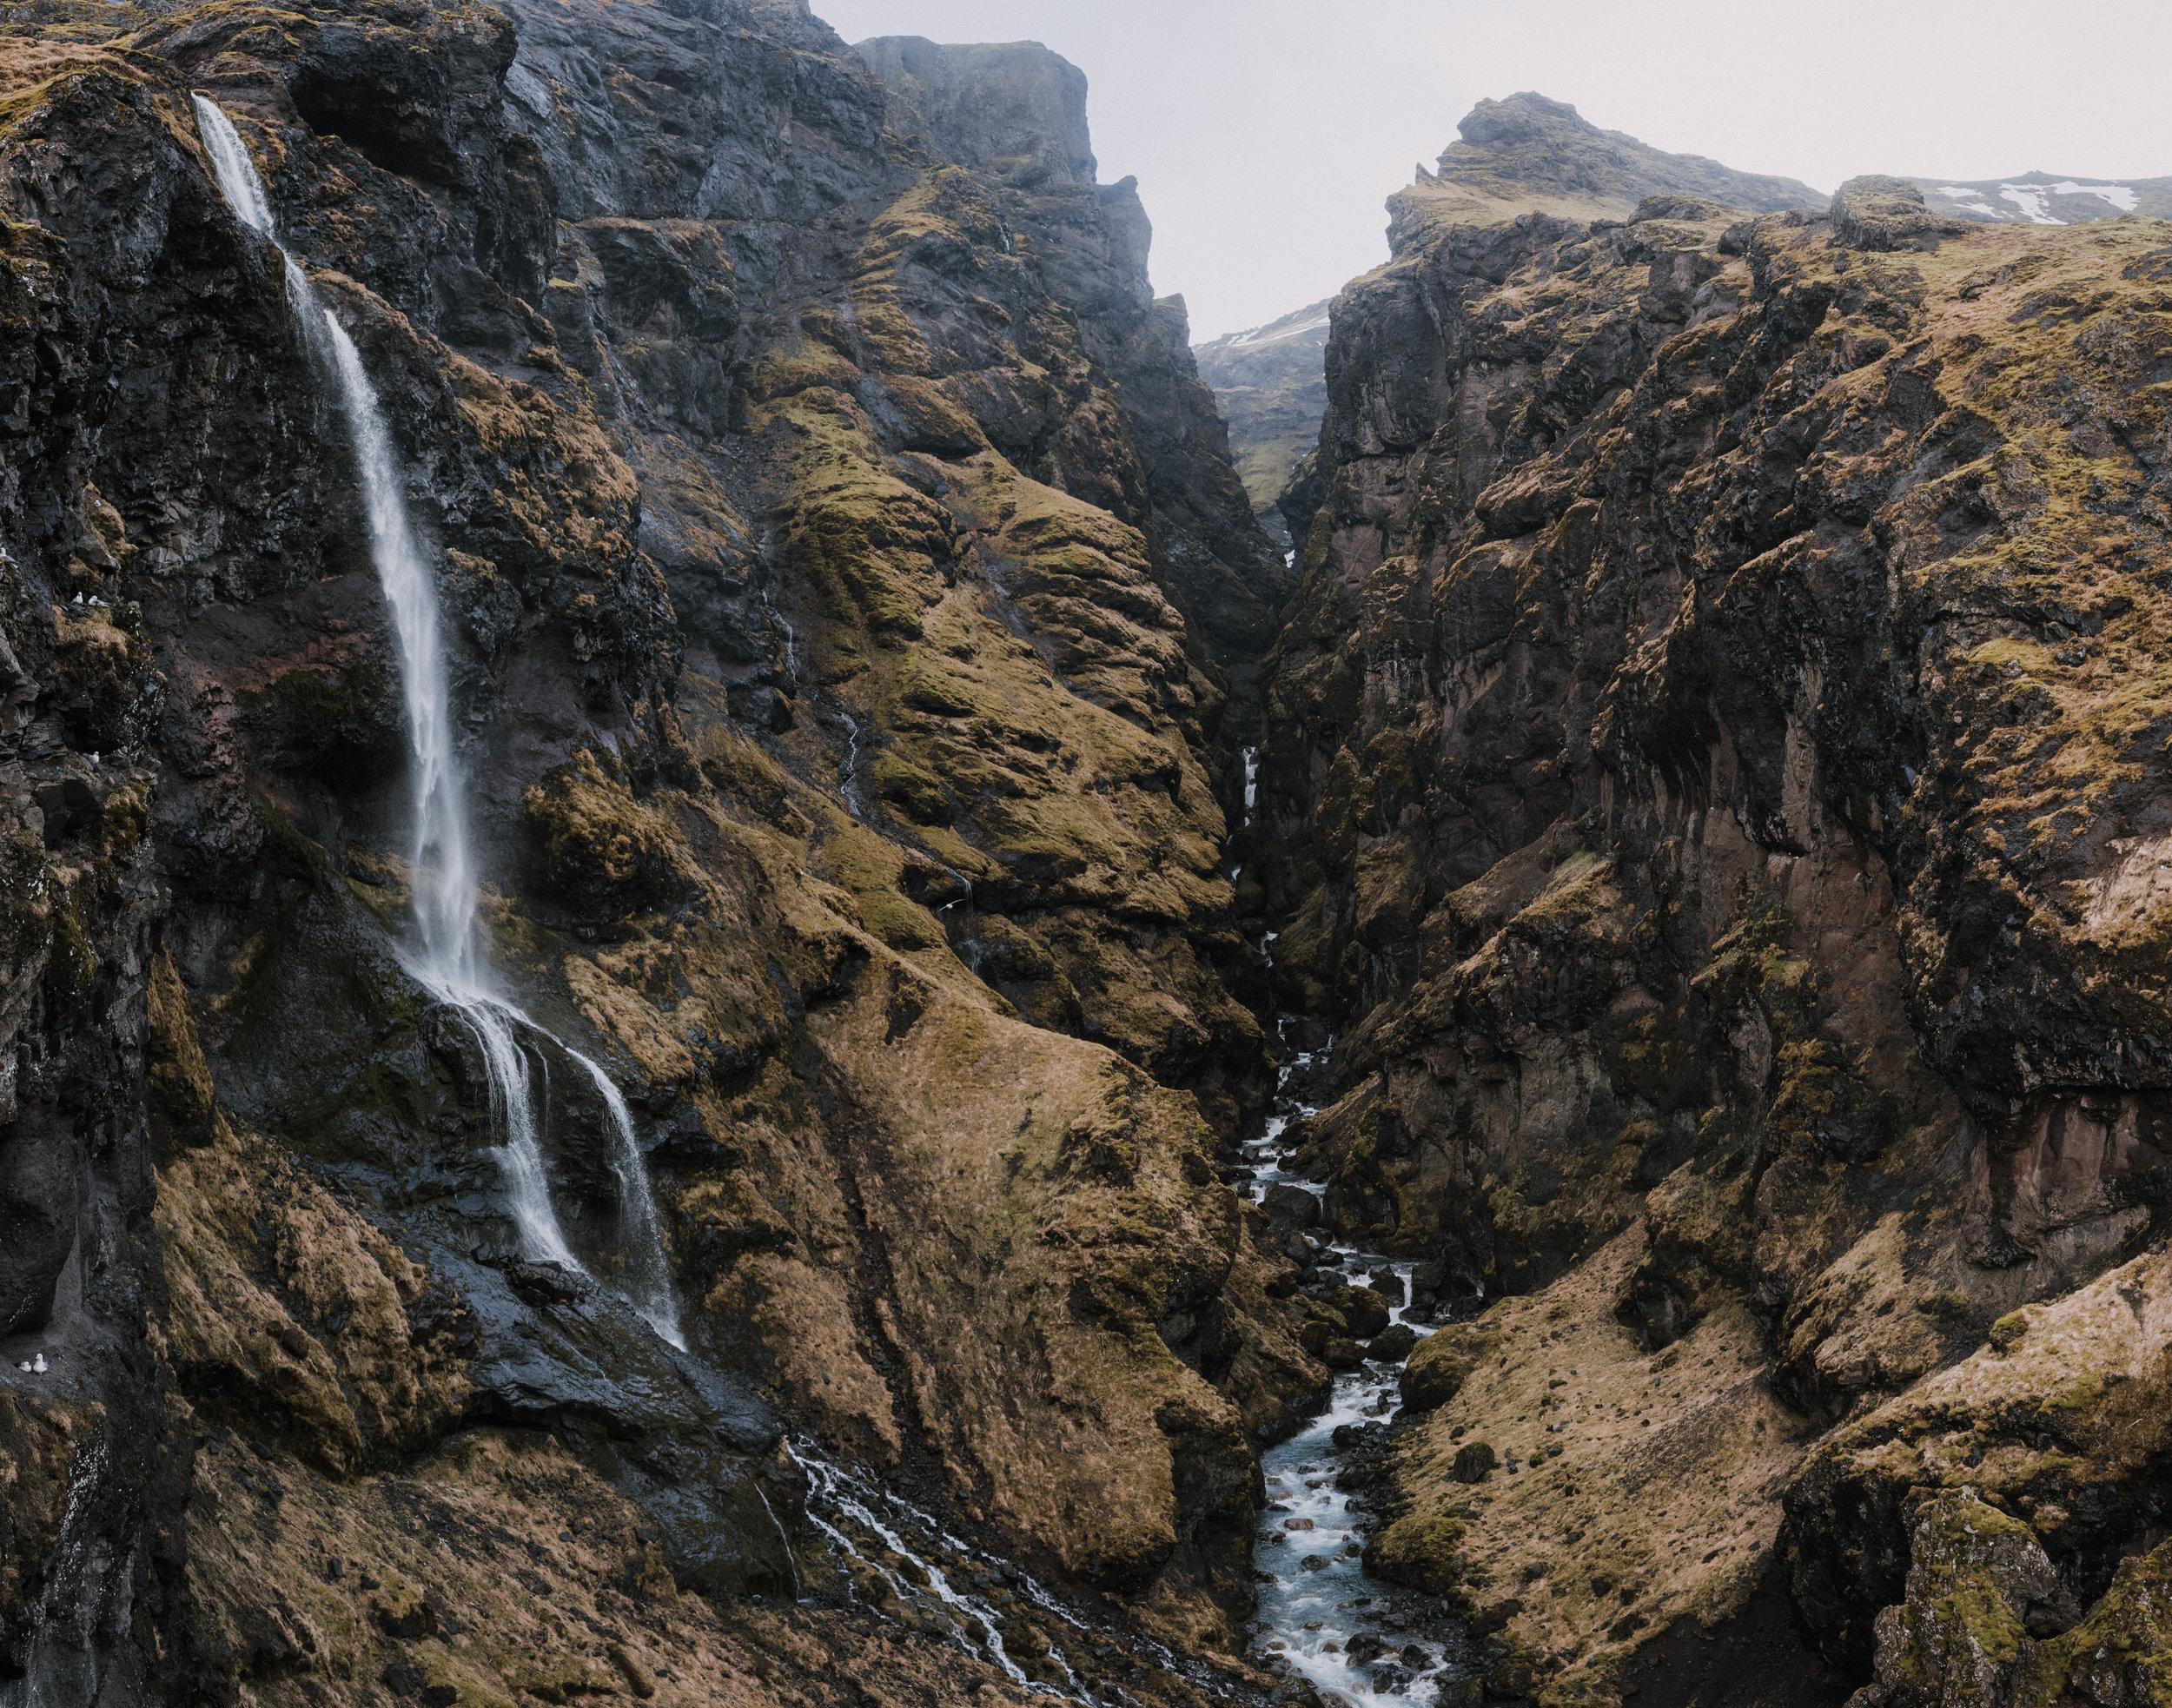 ICELAND_WOMAN_PHOTOGRAPHER_TARASHUPE_OUTDOOR_PHOTOGRAPHY_031.jpg